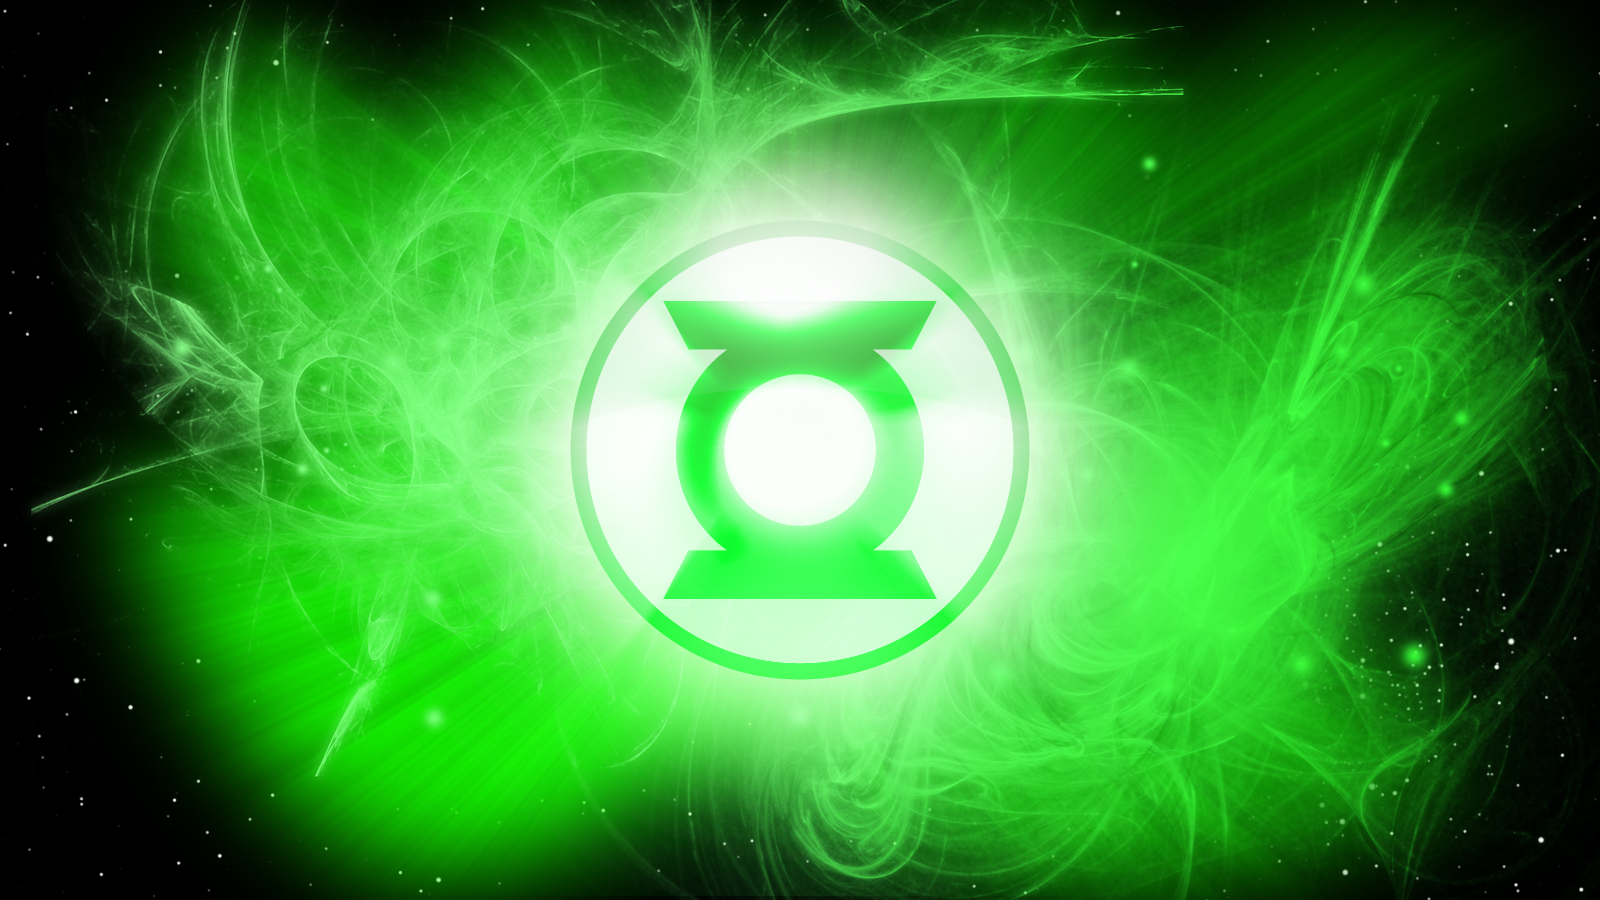 Green Lantern HD images